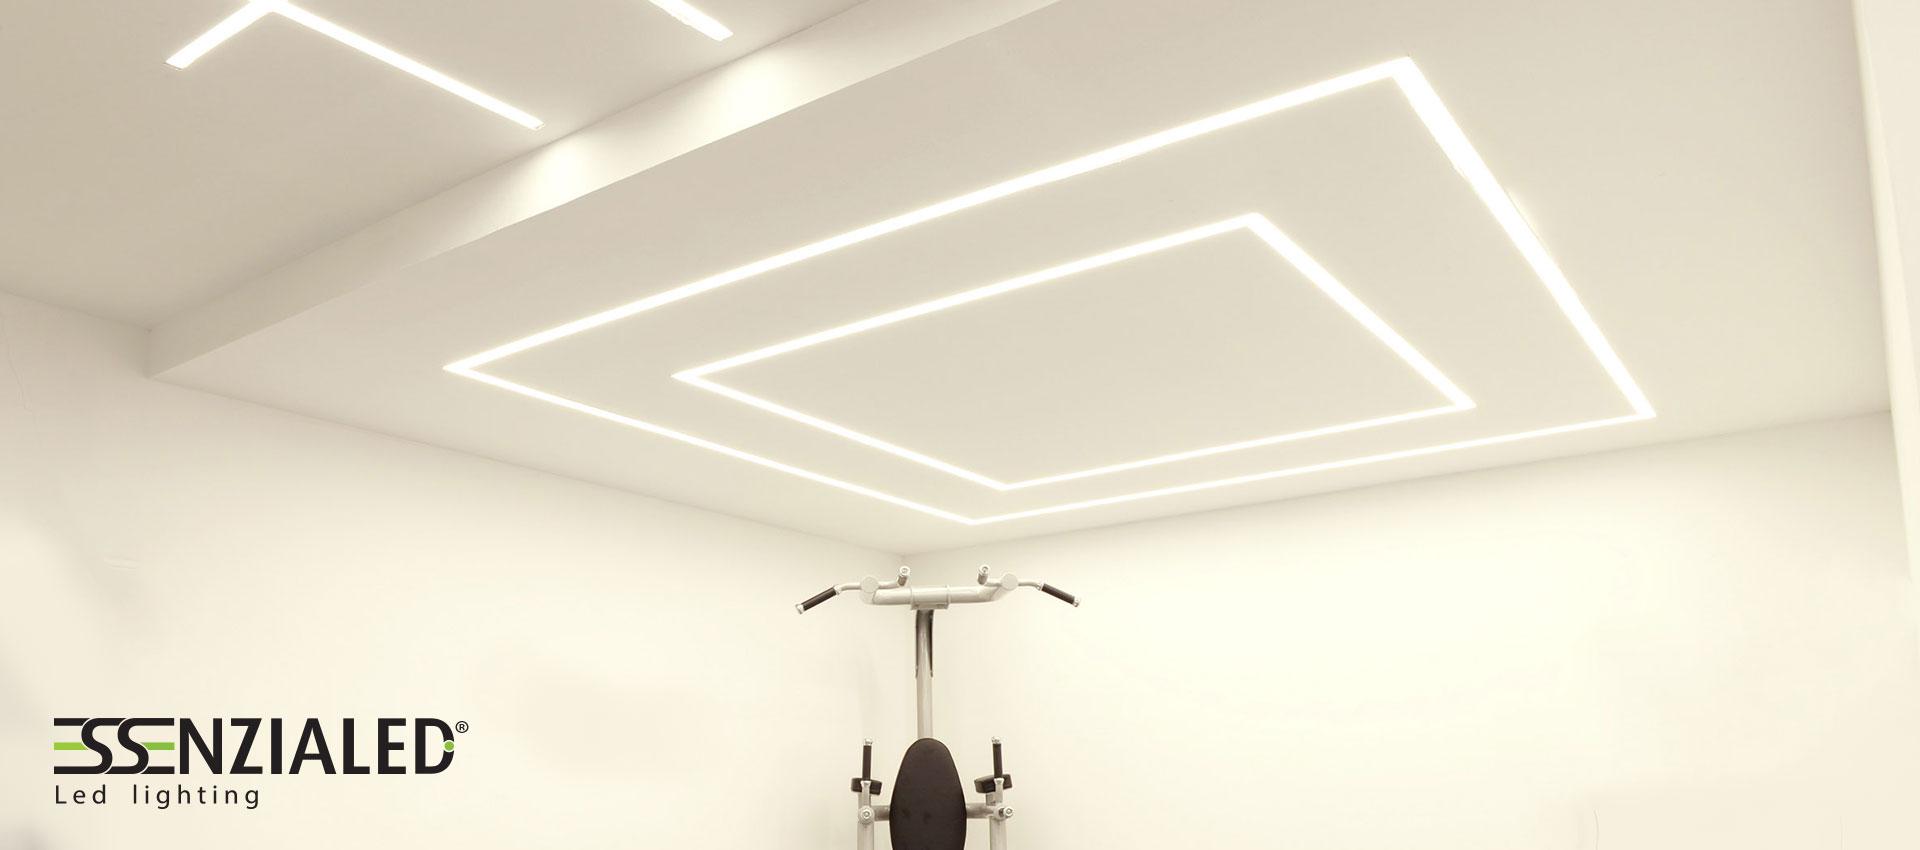 Luci Led Ufficio.Inside Recessed Linear Led Profile Essential Light And